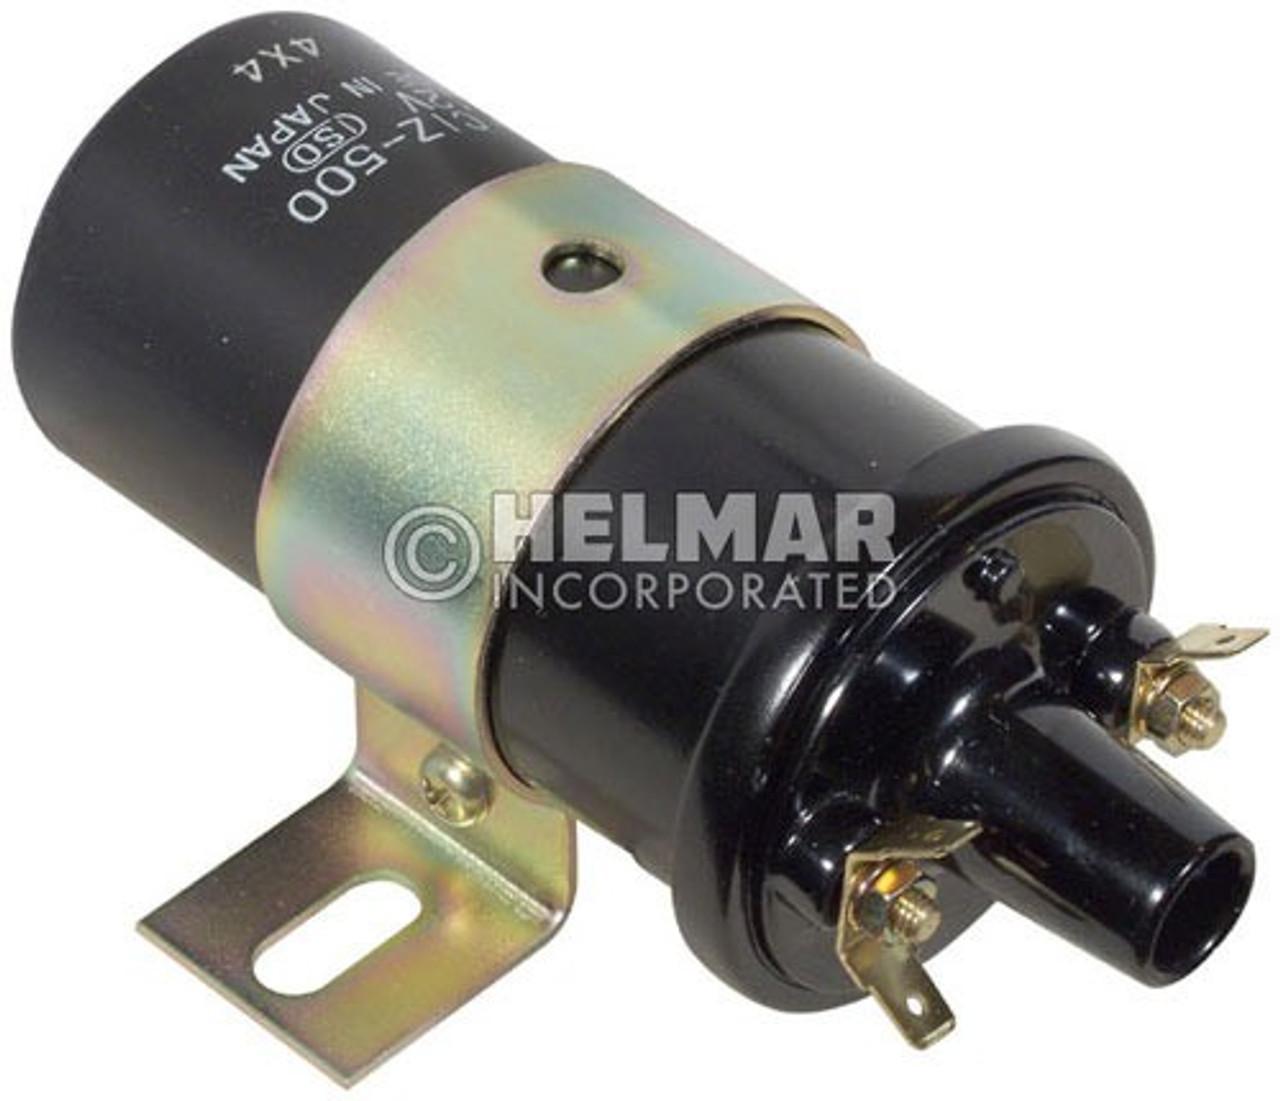 1324278 Hyster Original Hitachi Ignition Coil, 12 Volt Internal Resistor, Type A